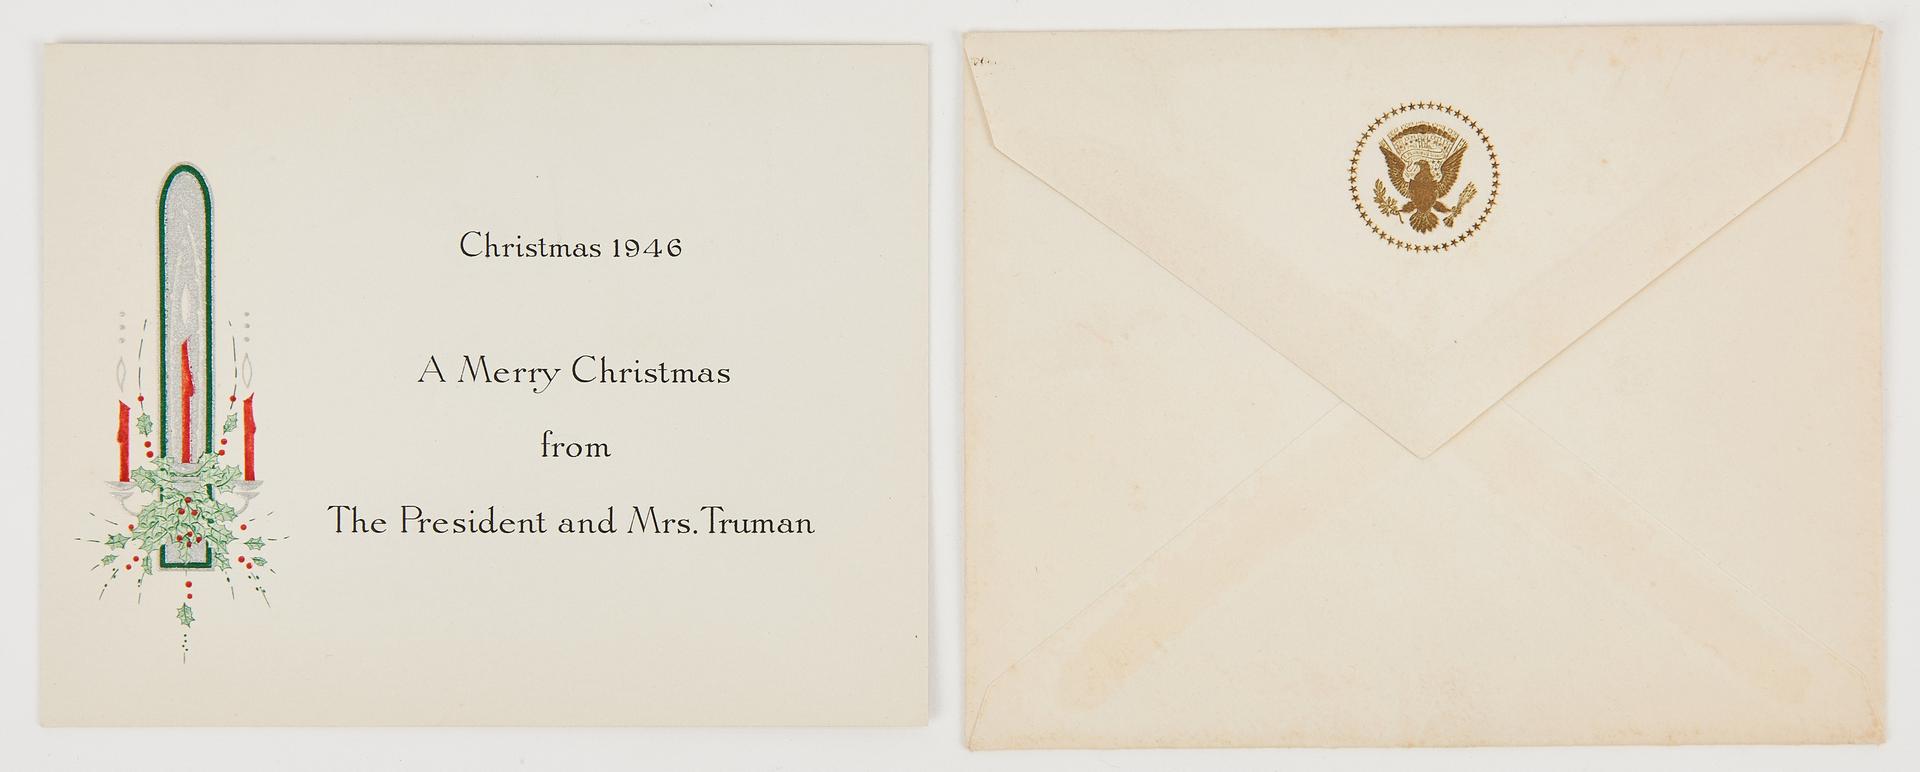 Lot 640: 14 Roosevelt/Truman Admin. Items, incl. Signed Photos